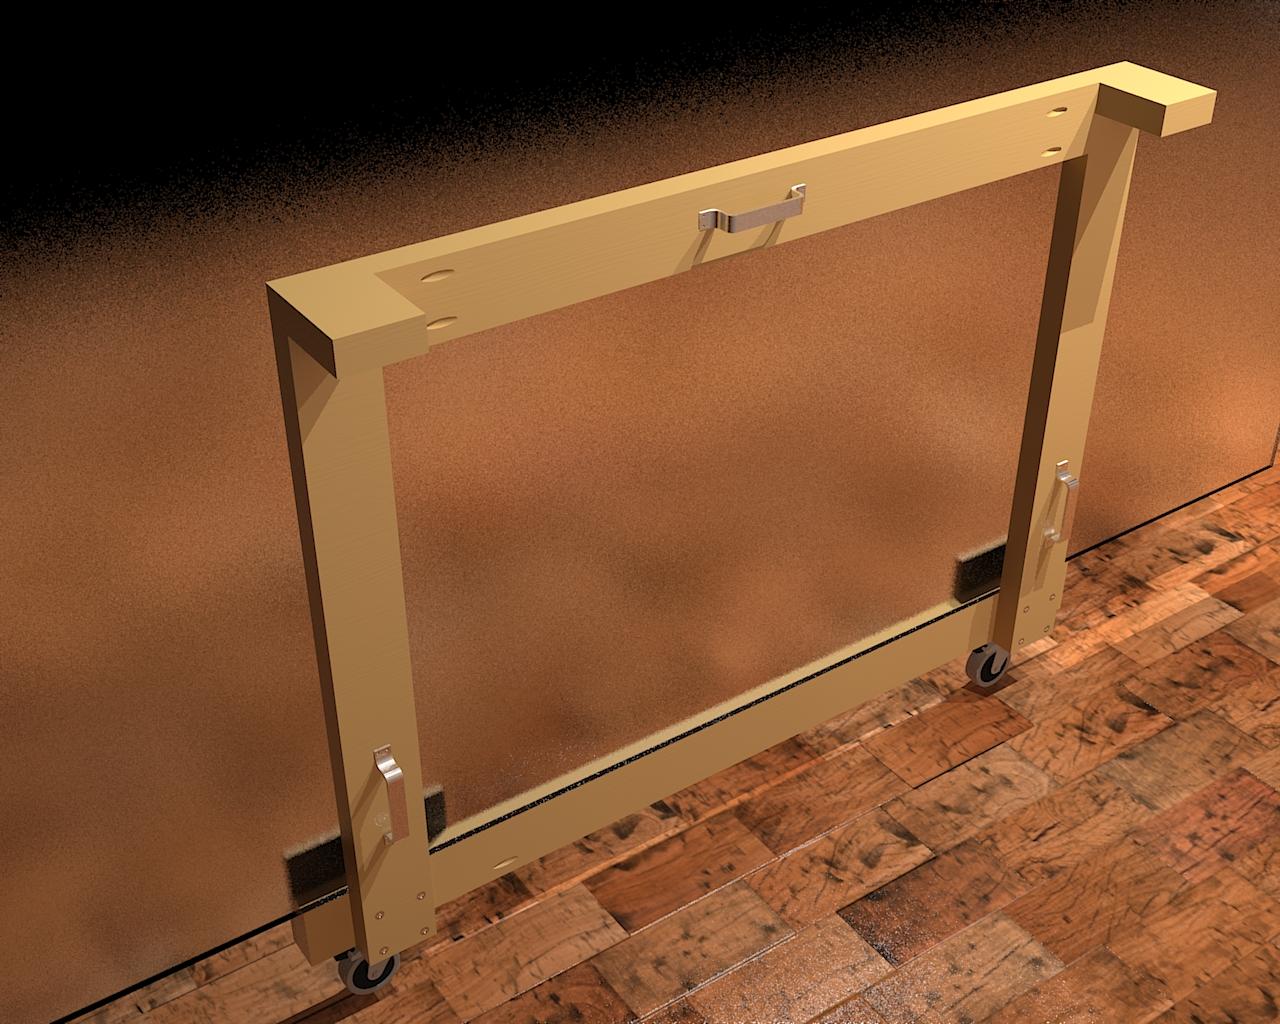 Diy Drywall Plywood Panel Carrier